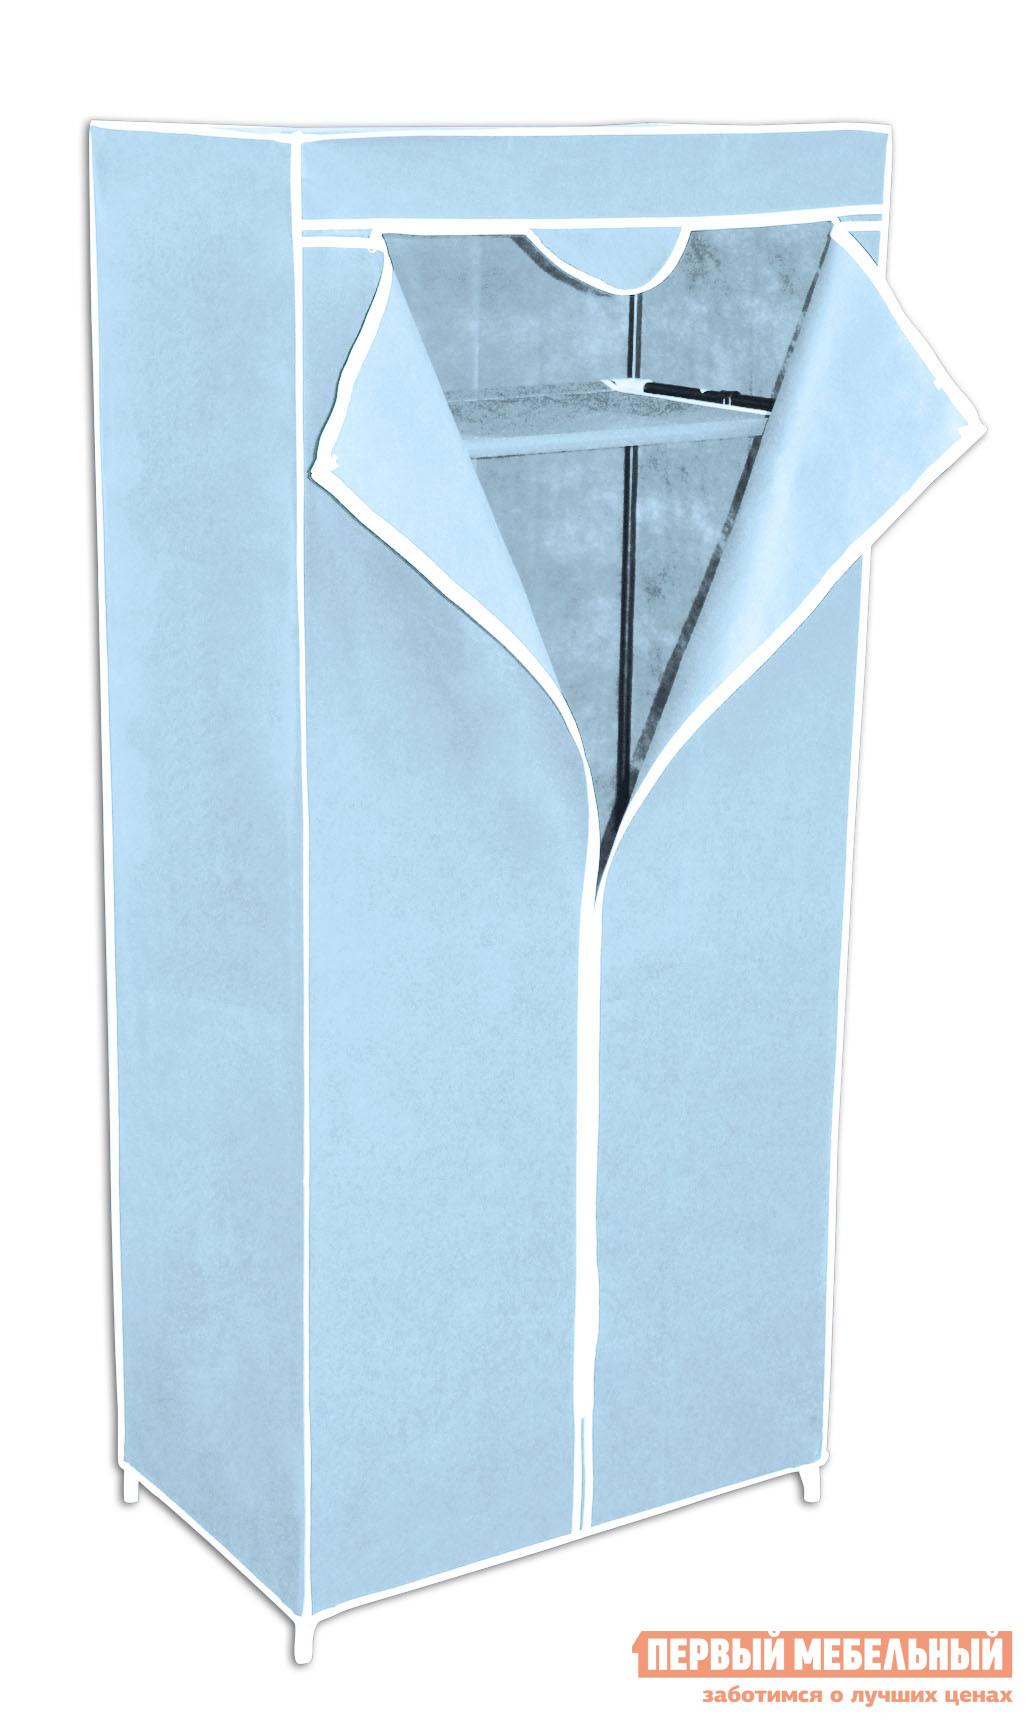 цена на Гардеробная вешалка ТАЛАНТ SHT-2012